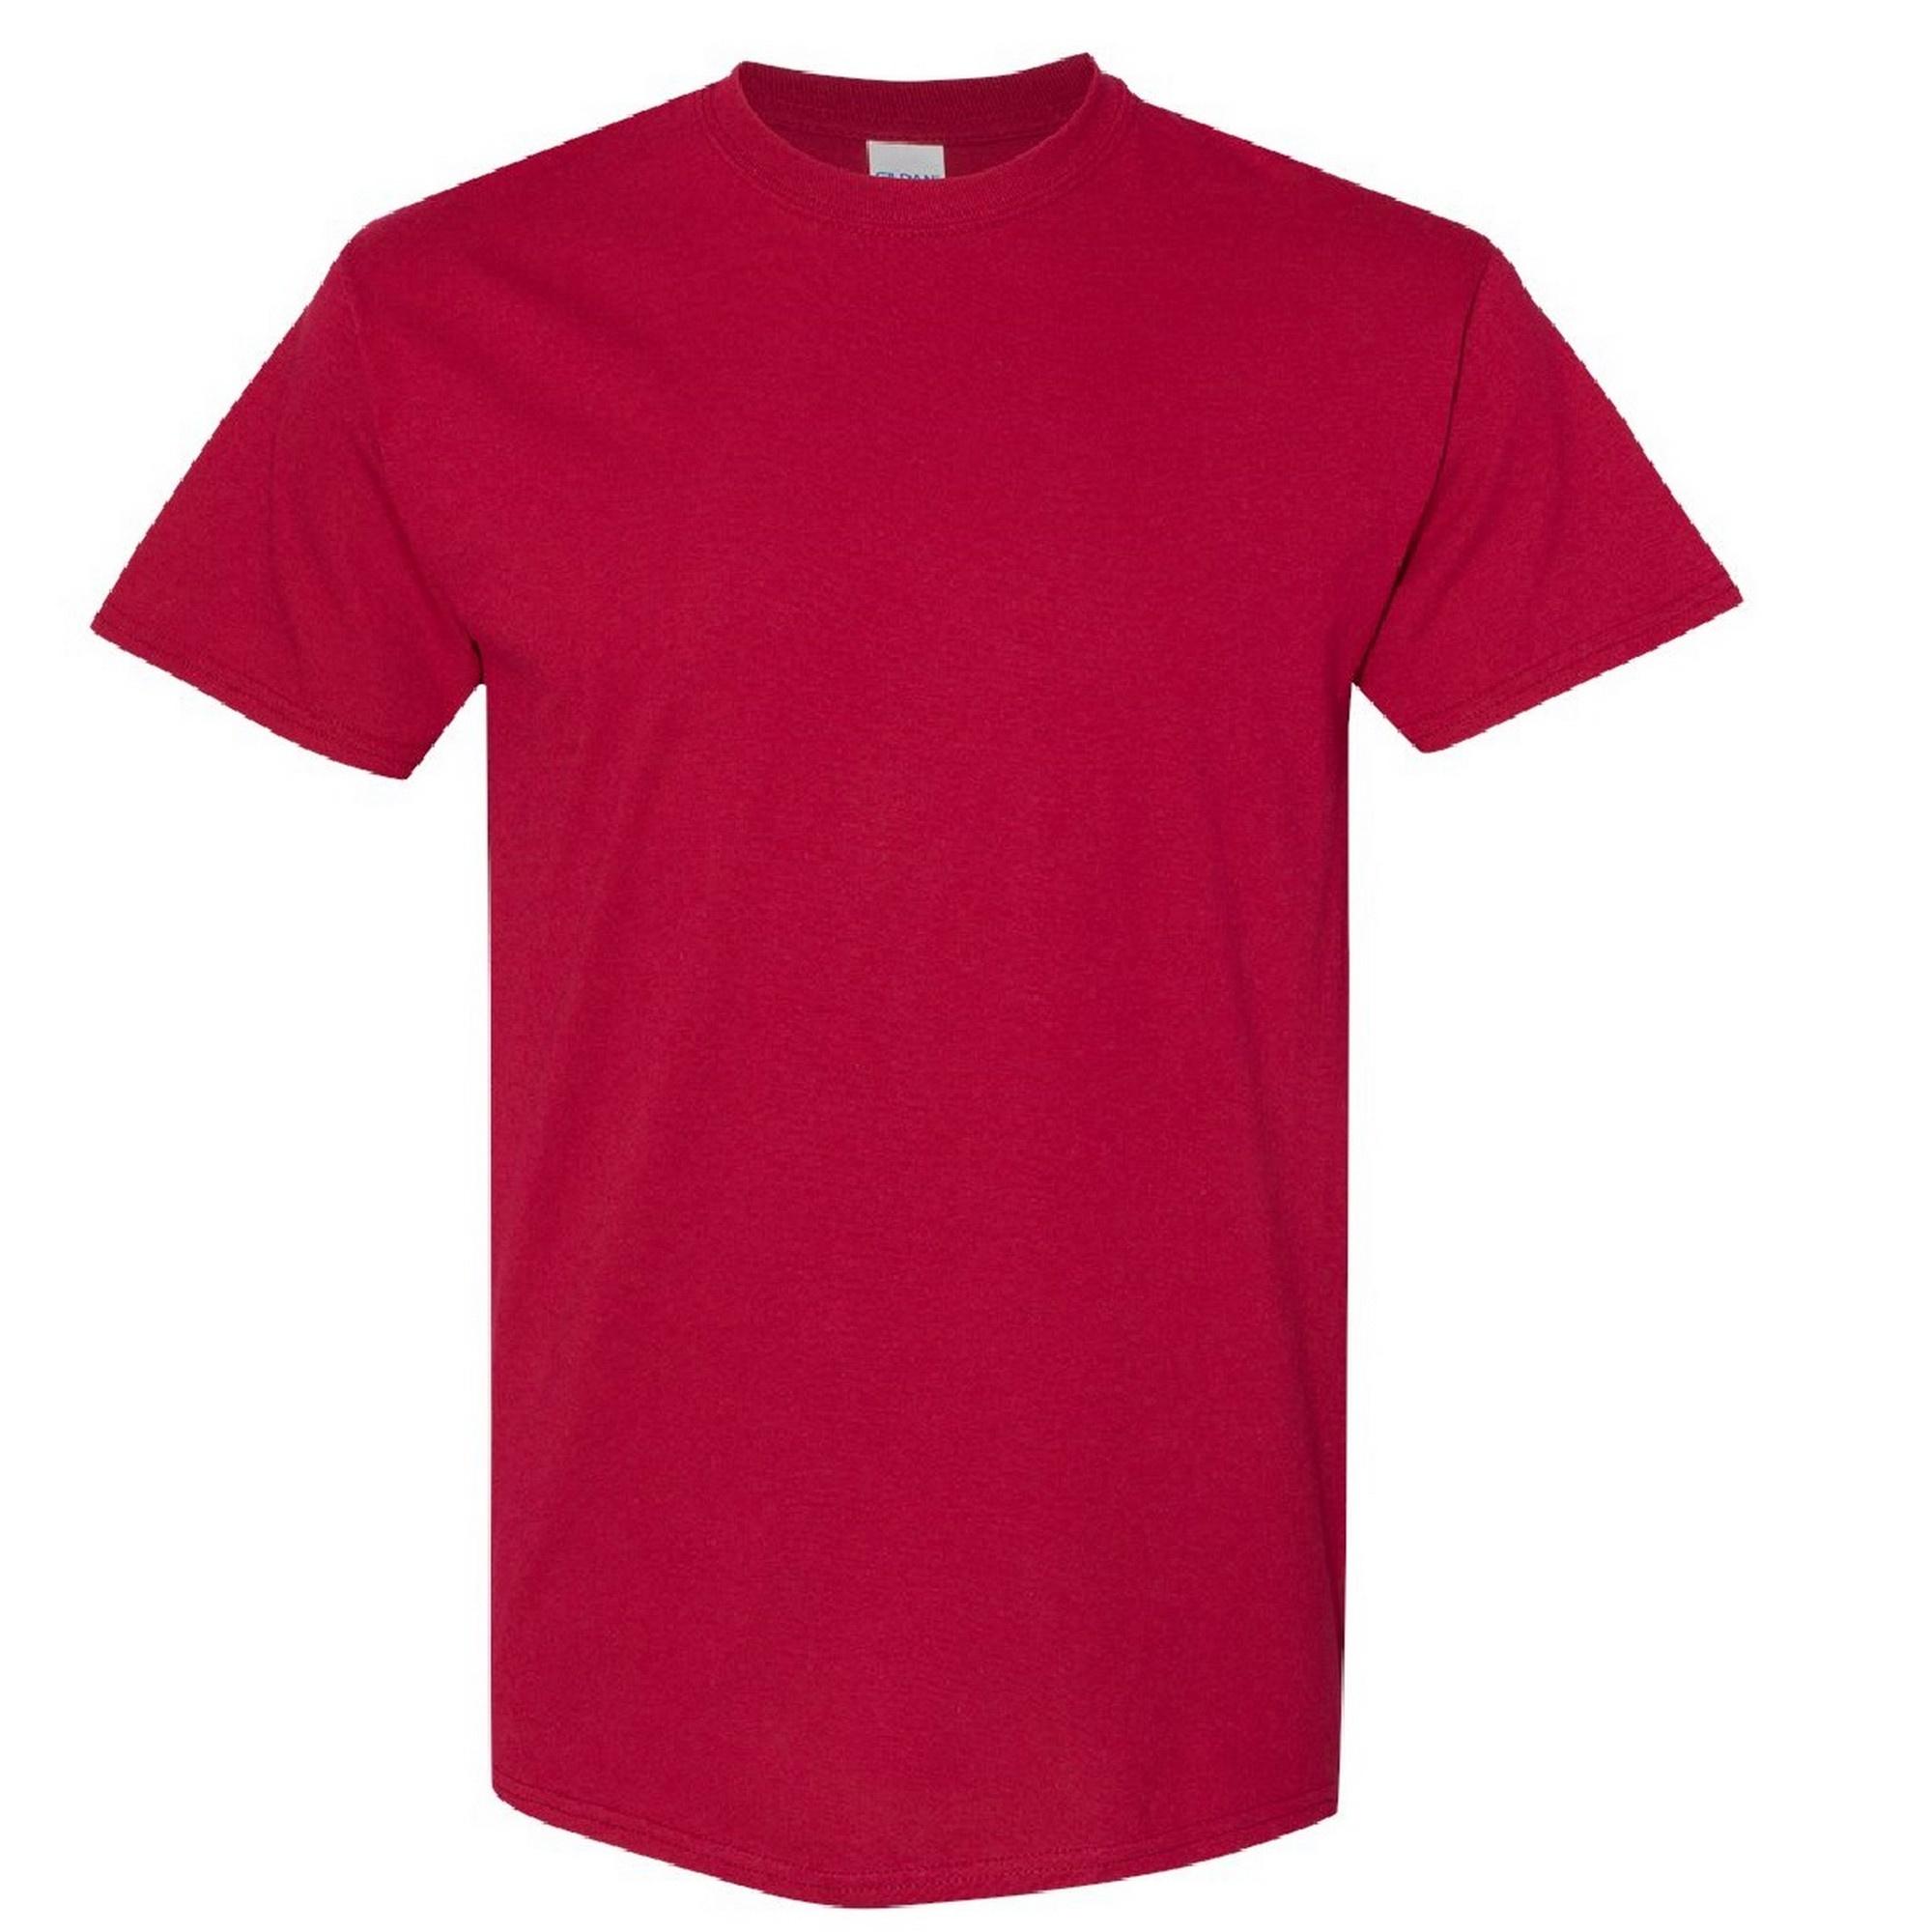 Gildan Mens Heavy Cotton Short Sleeve T-Shirt (S) (Cardinal)